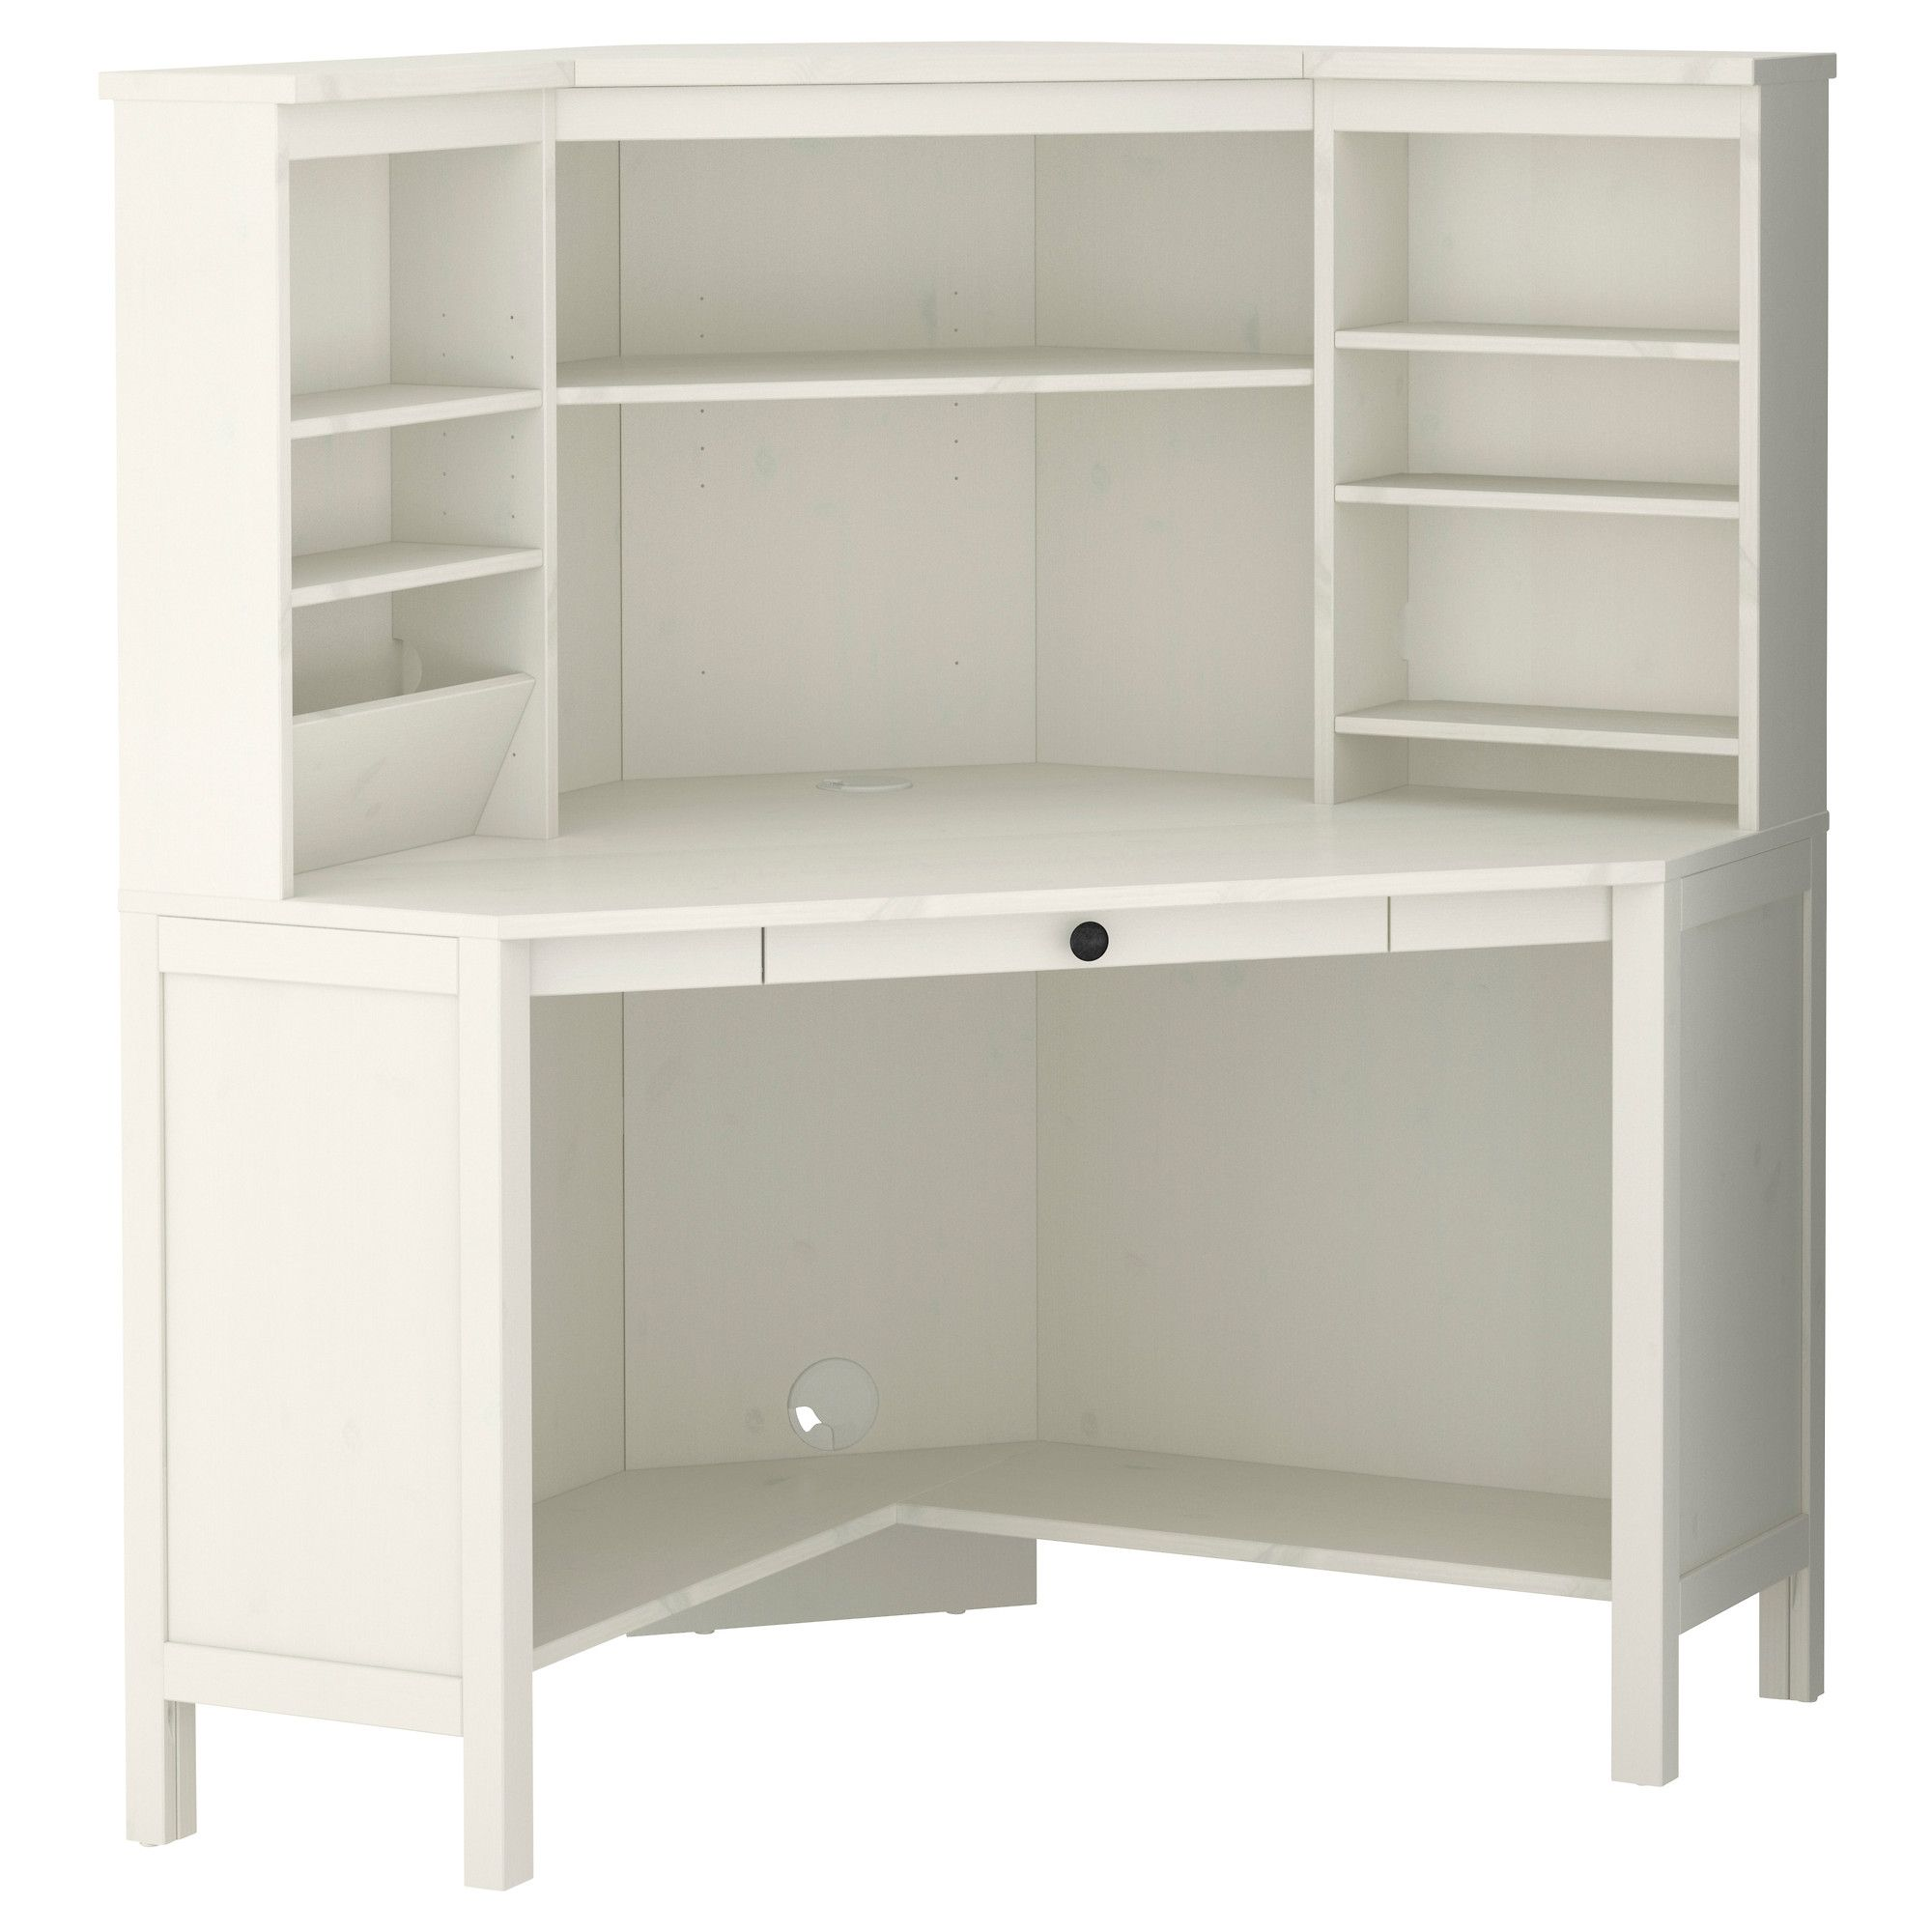 Ikea Us Furniture And Home Furnishings Corner Workstation